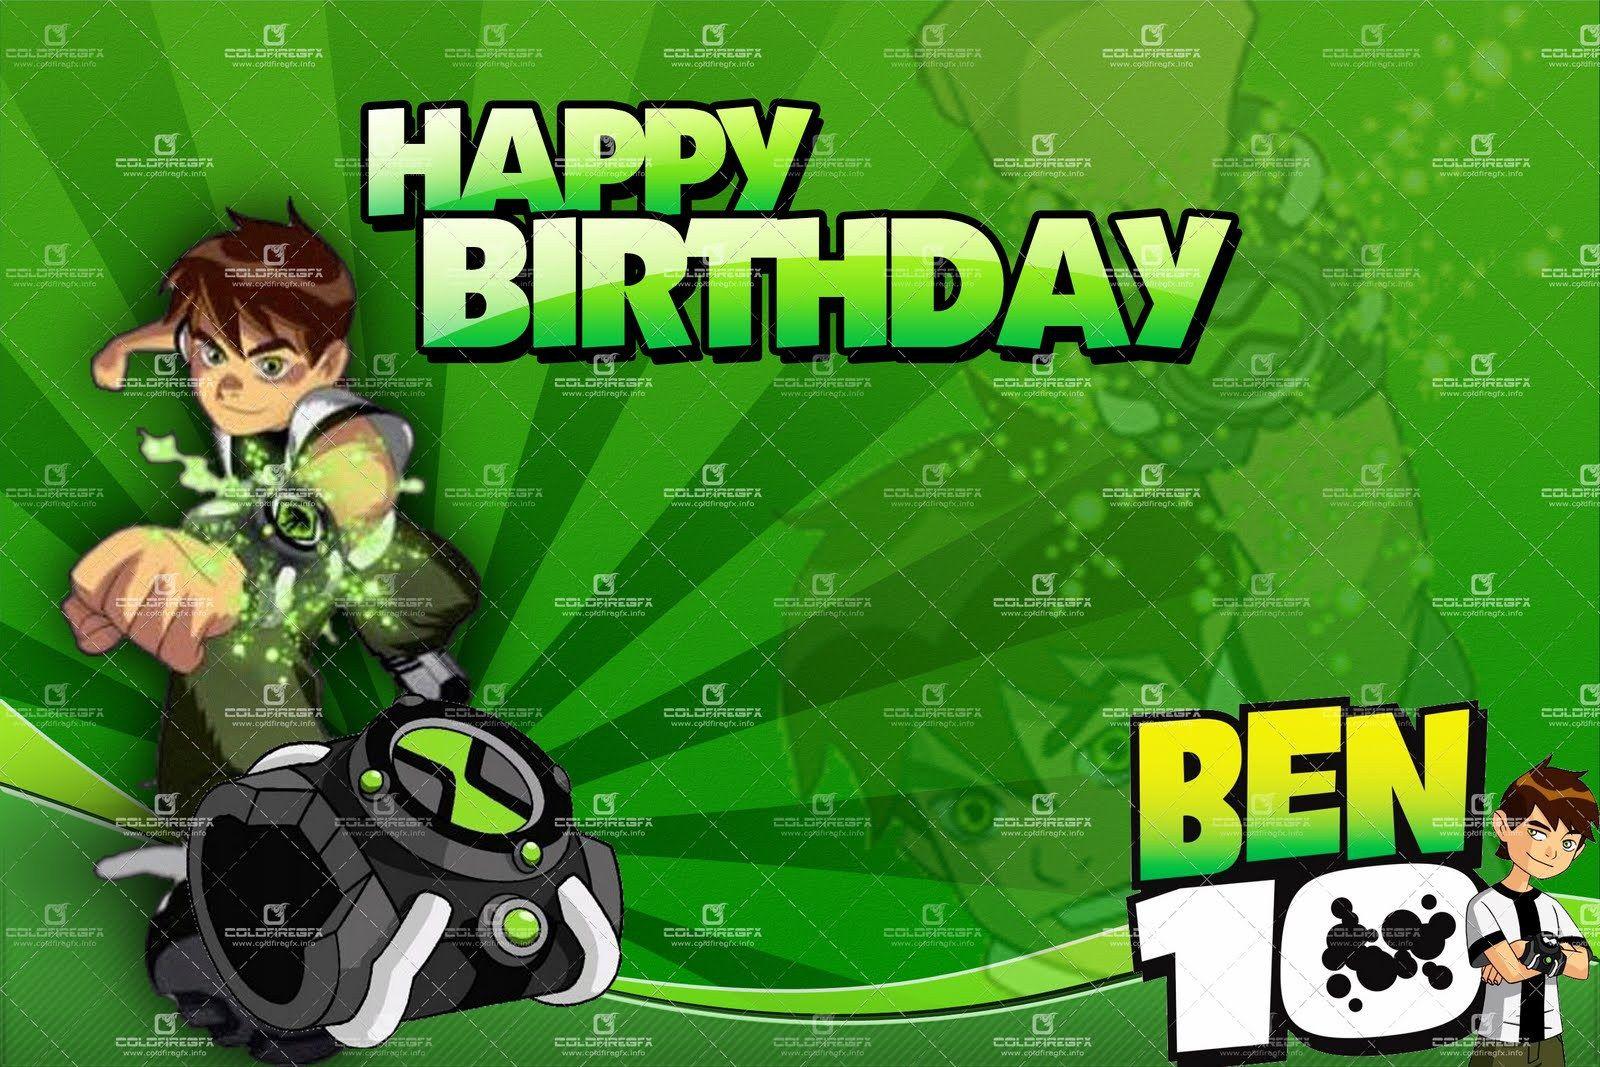 Birthday Card Psd Free Download July 2014 Ideas Ben 10 Birthday 10th Birthday Invitation Birthday Invitations